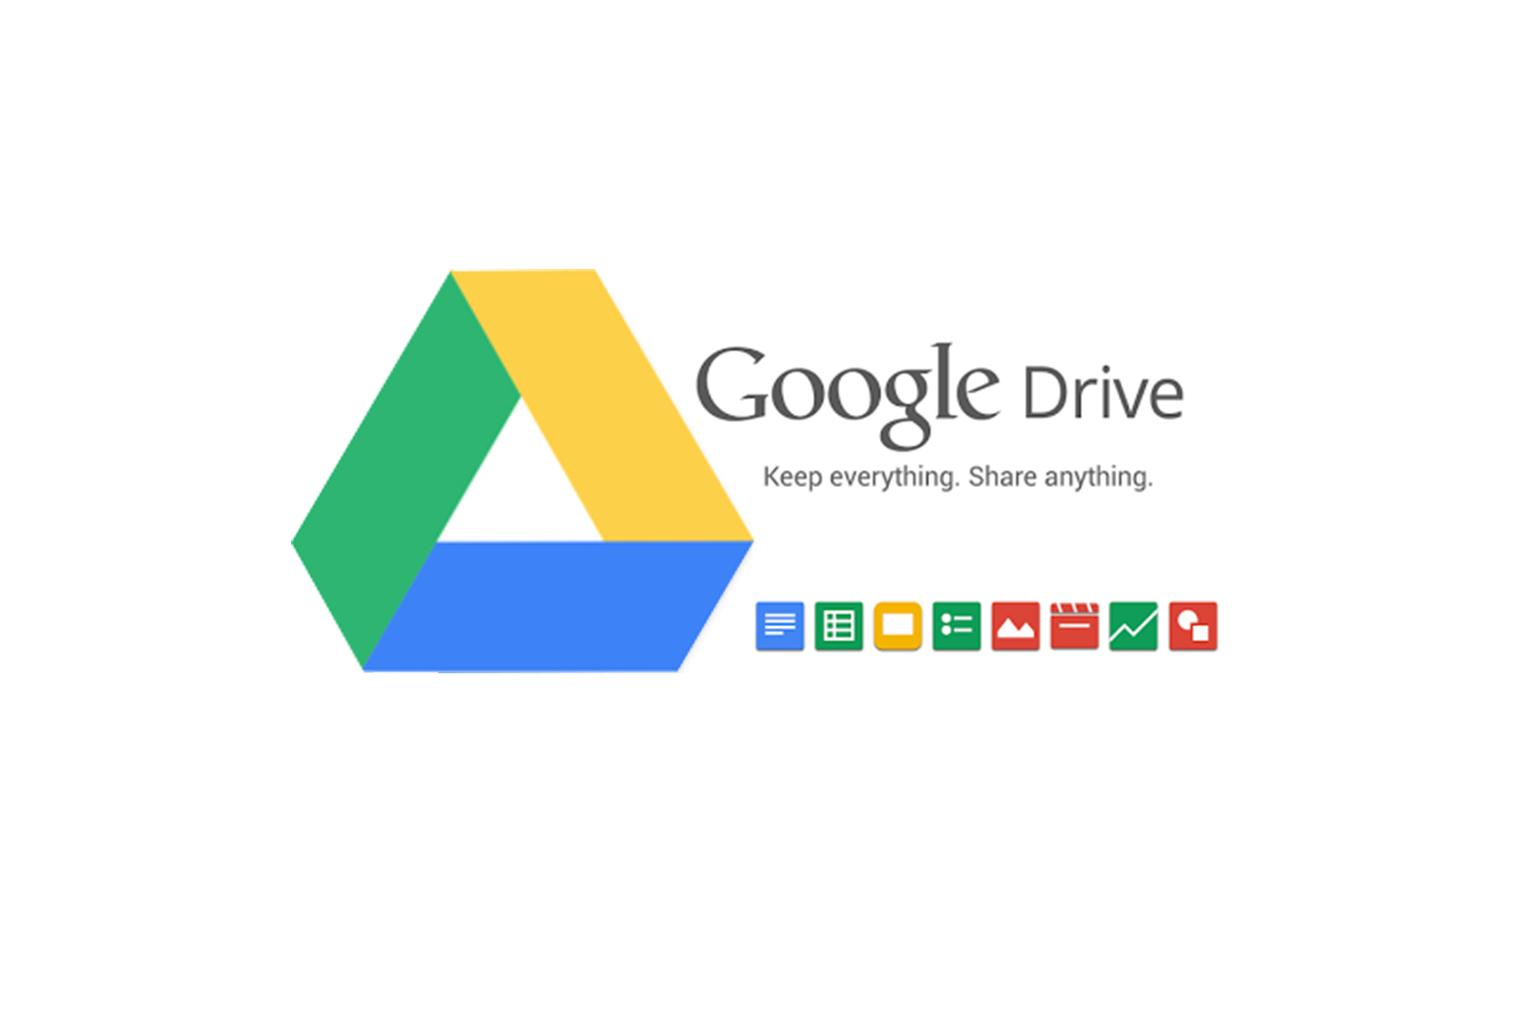 cach-tai-anh-len-google-drive-bang-iphone